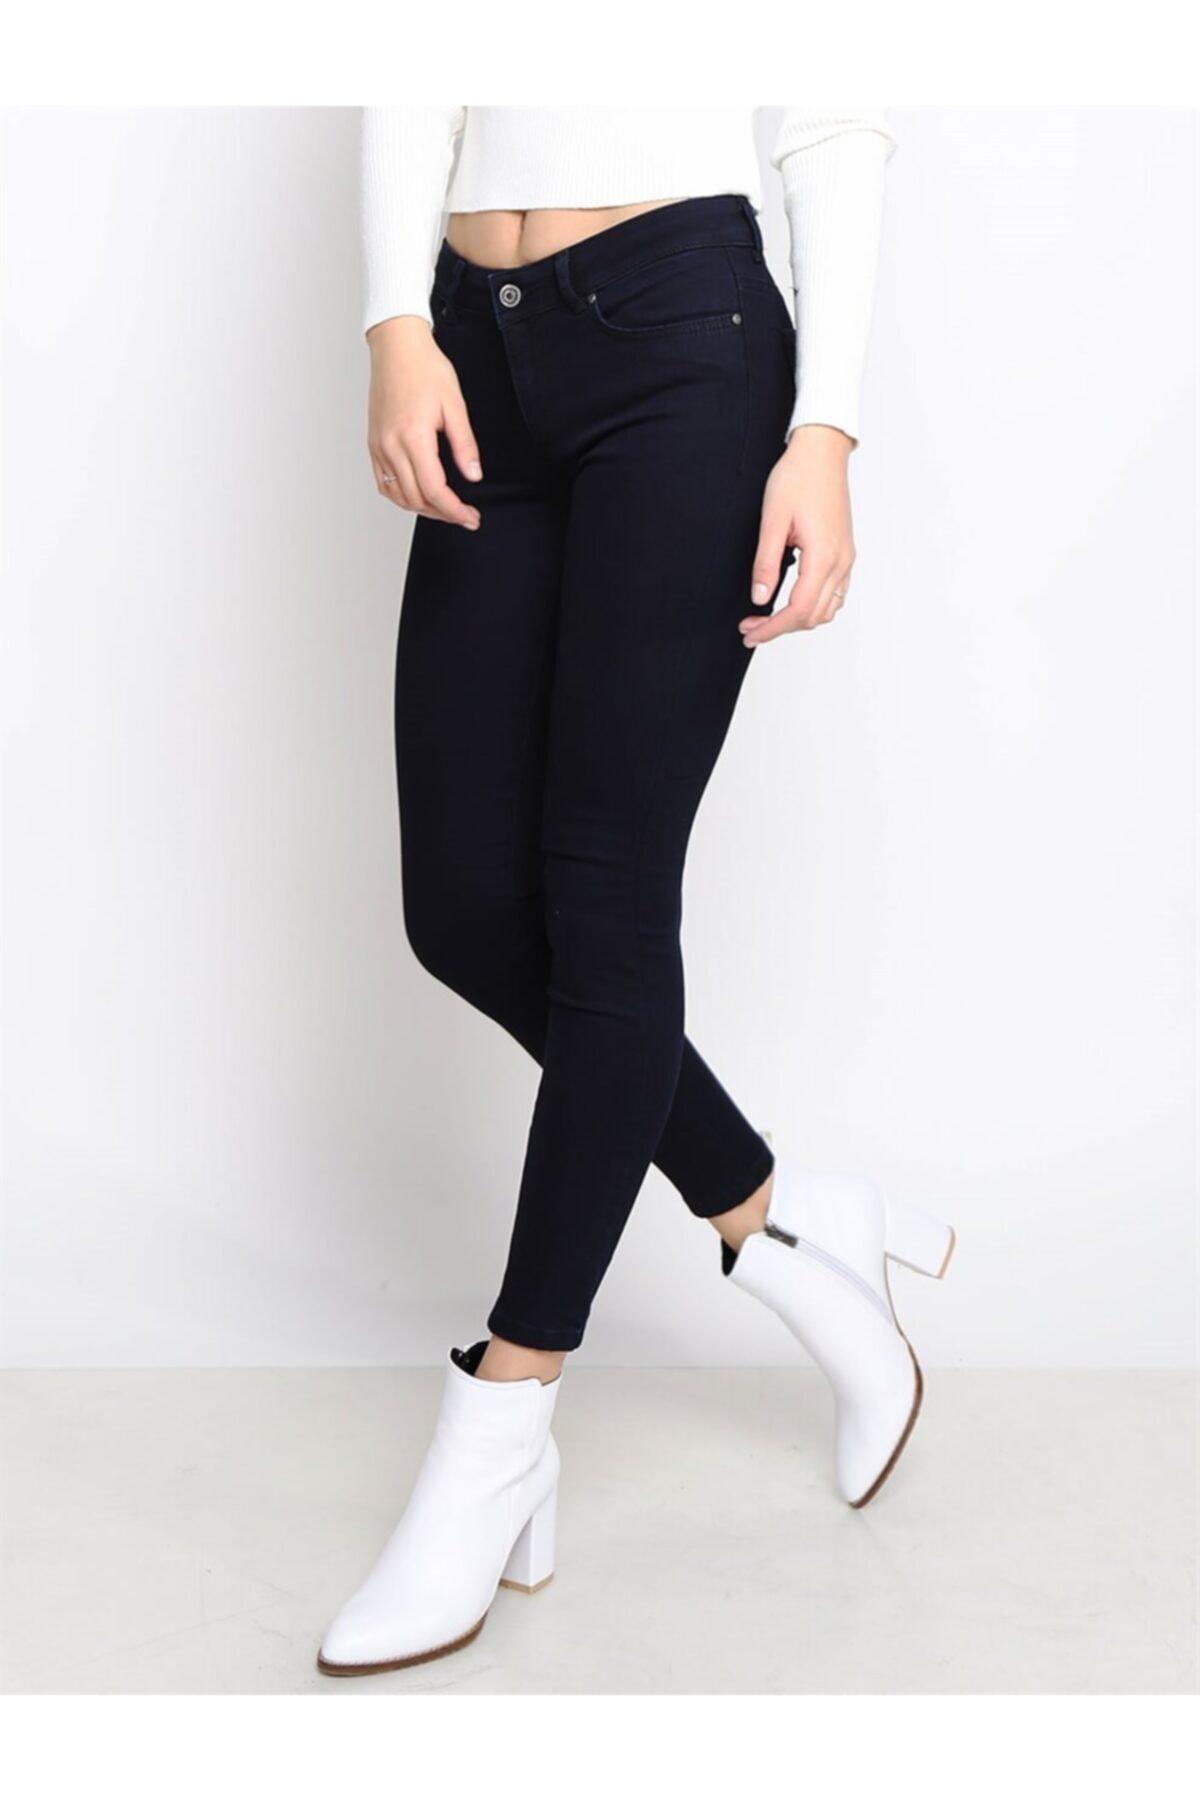 Twister Jeans Kadın Slim Fit Orta Bel Pantolon Lıma 9046-35 35 2